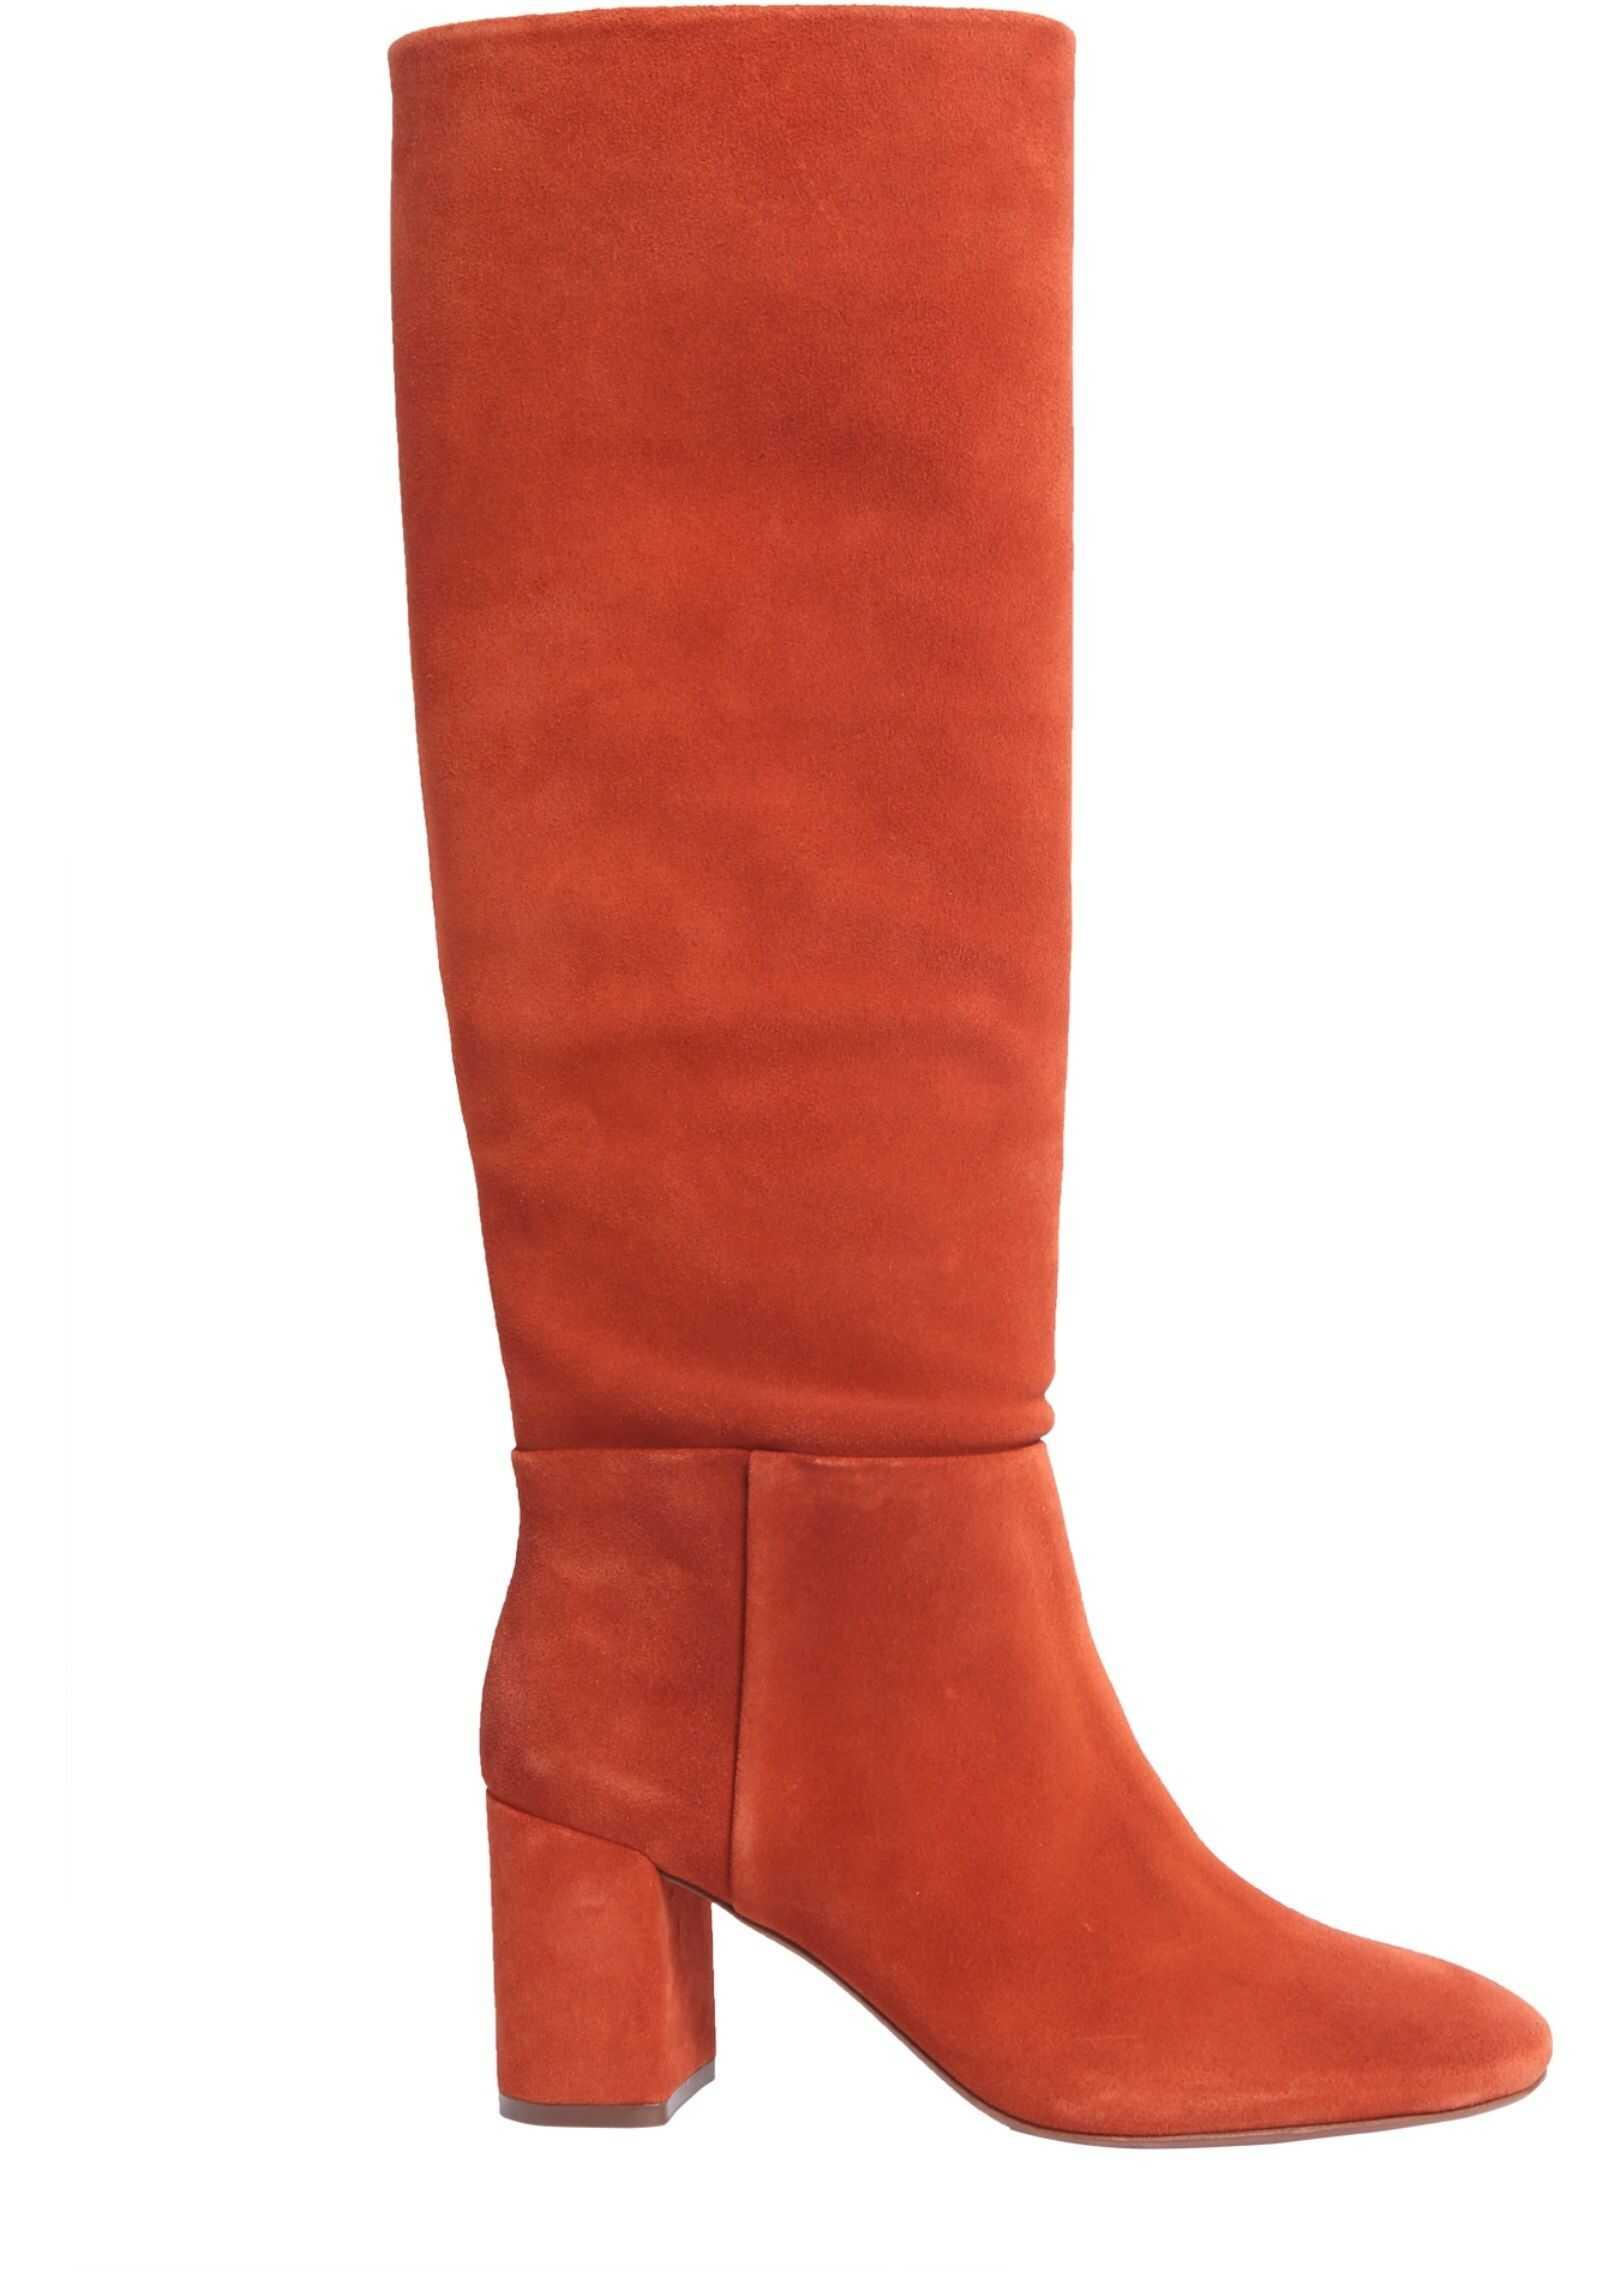 Tory Burch Brooke Slouchy Boots 49136_217 BROWN imagine b-mall.ro